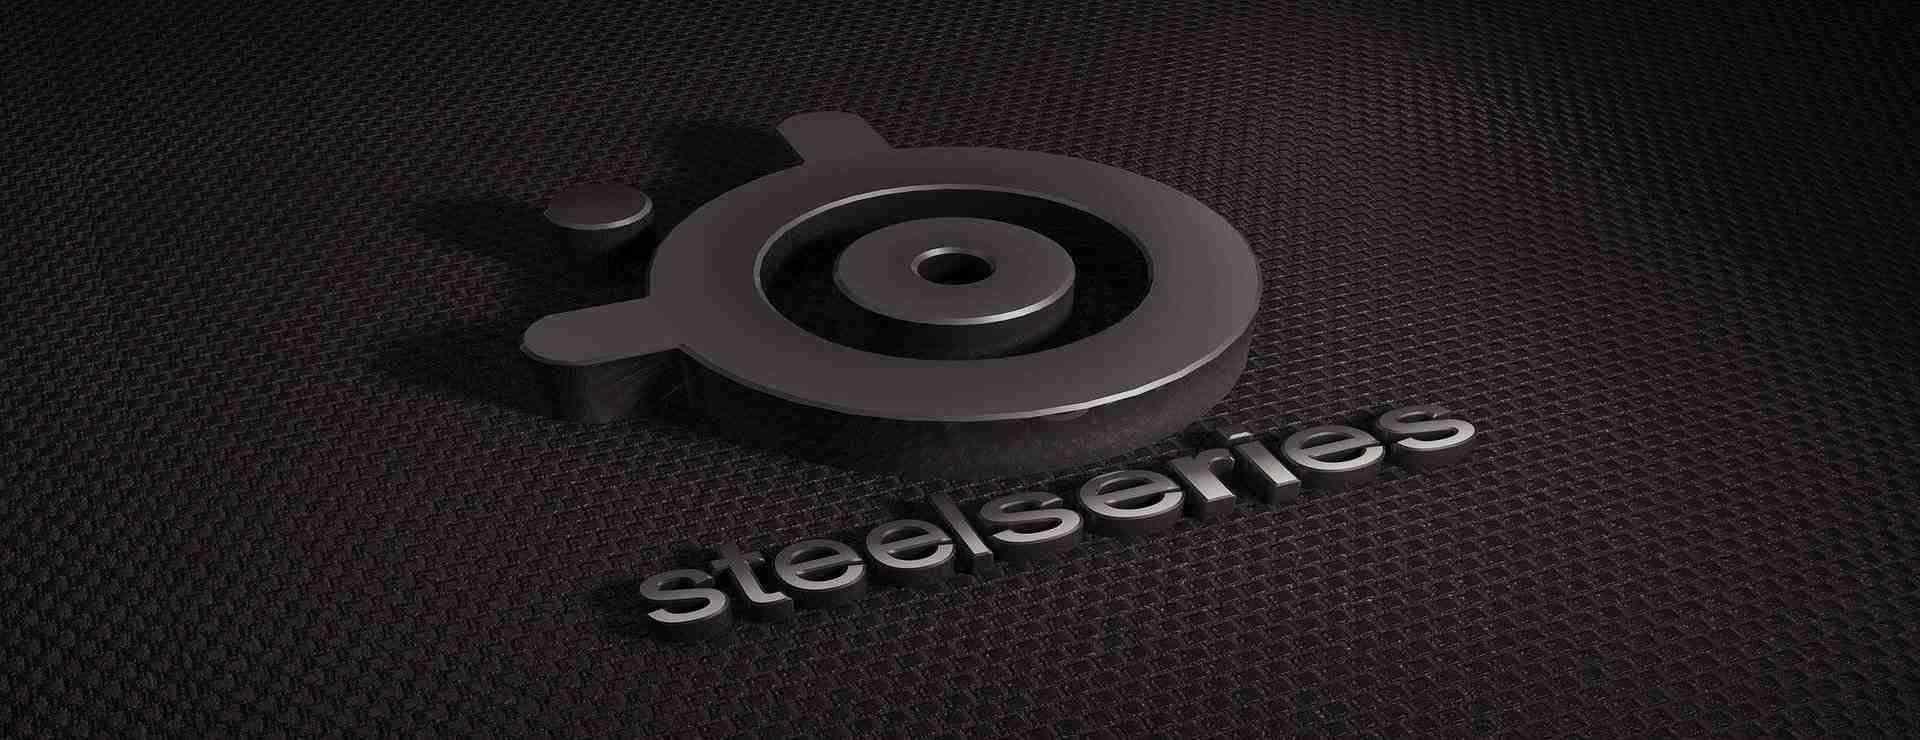 Steelseries Περιφερειακα